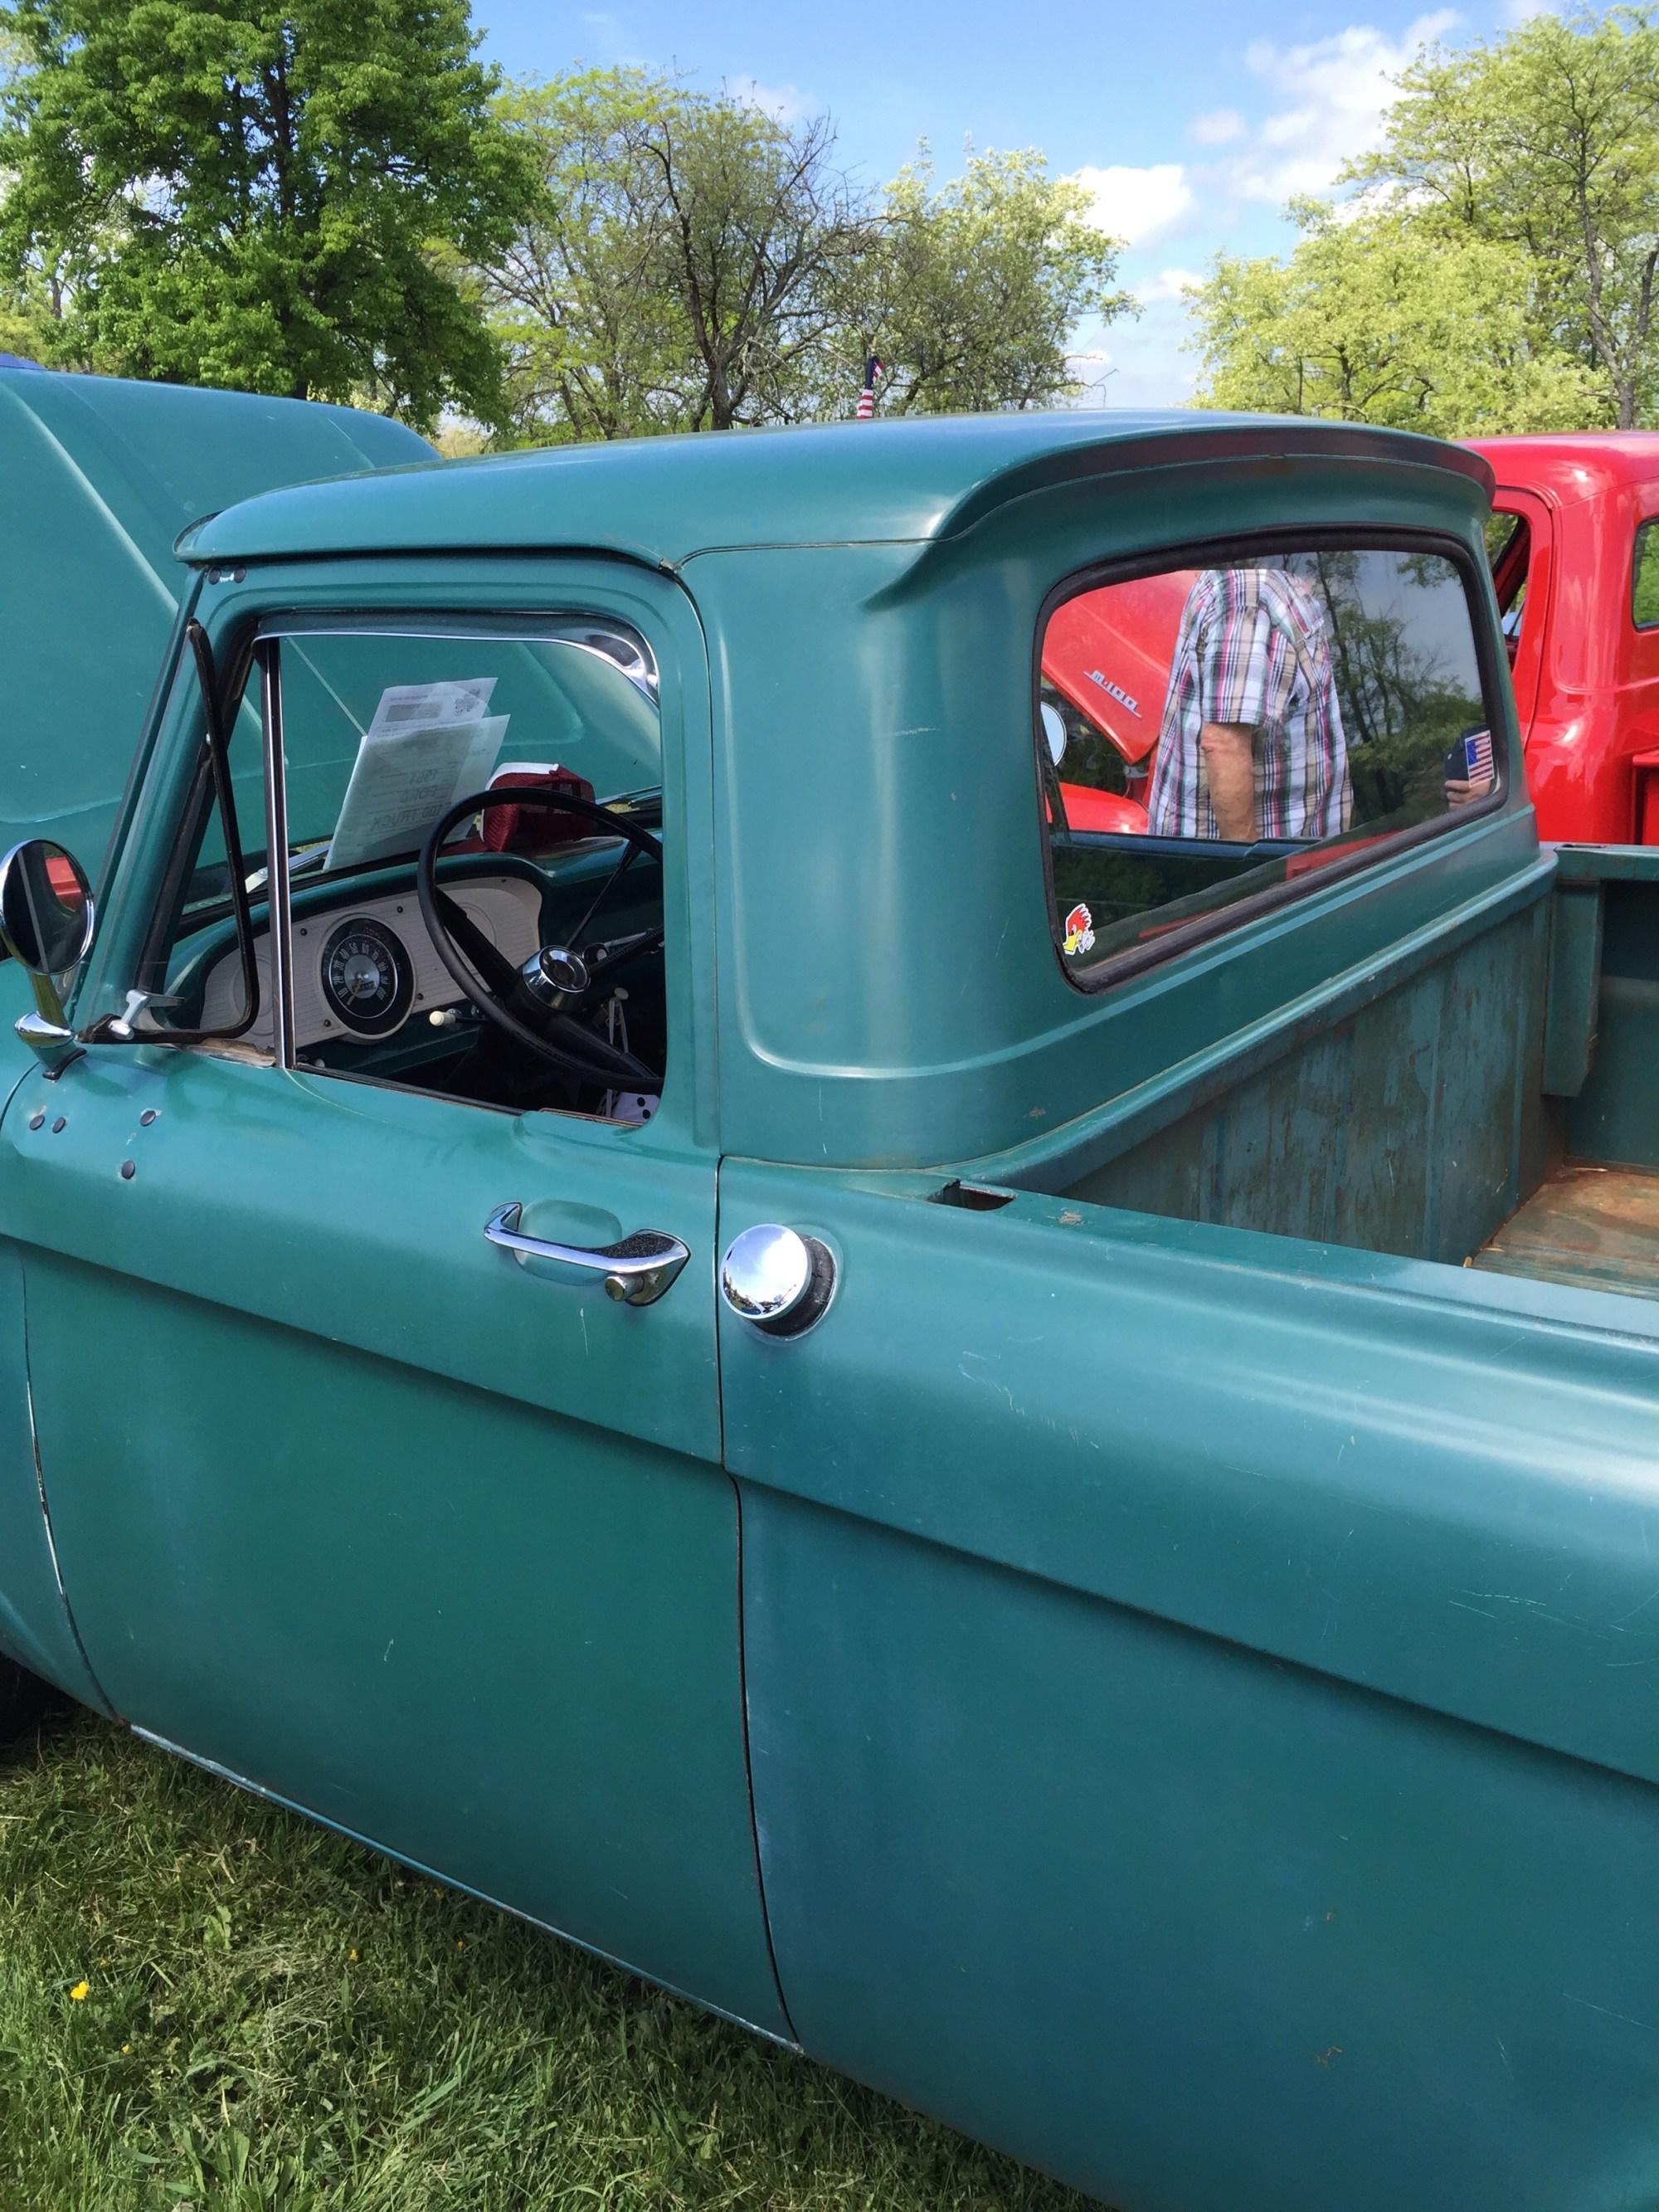 hight resolution of file 1961 ford f100 unibody pickup design factory original at 2015 shenandoah aaca meet 5of6 jpg